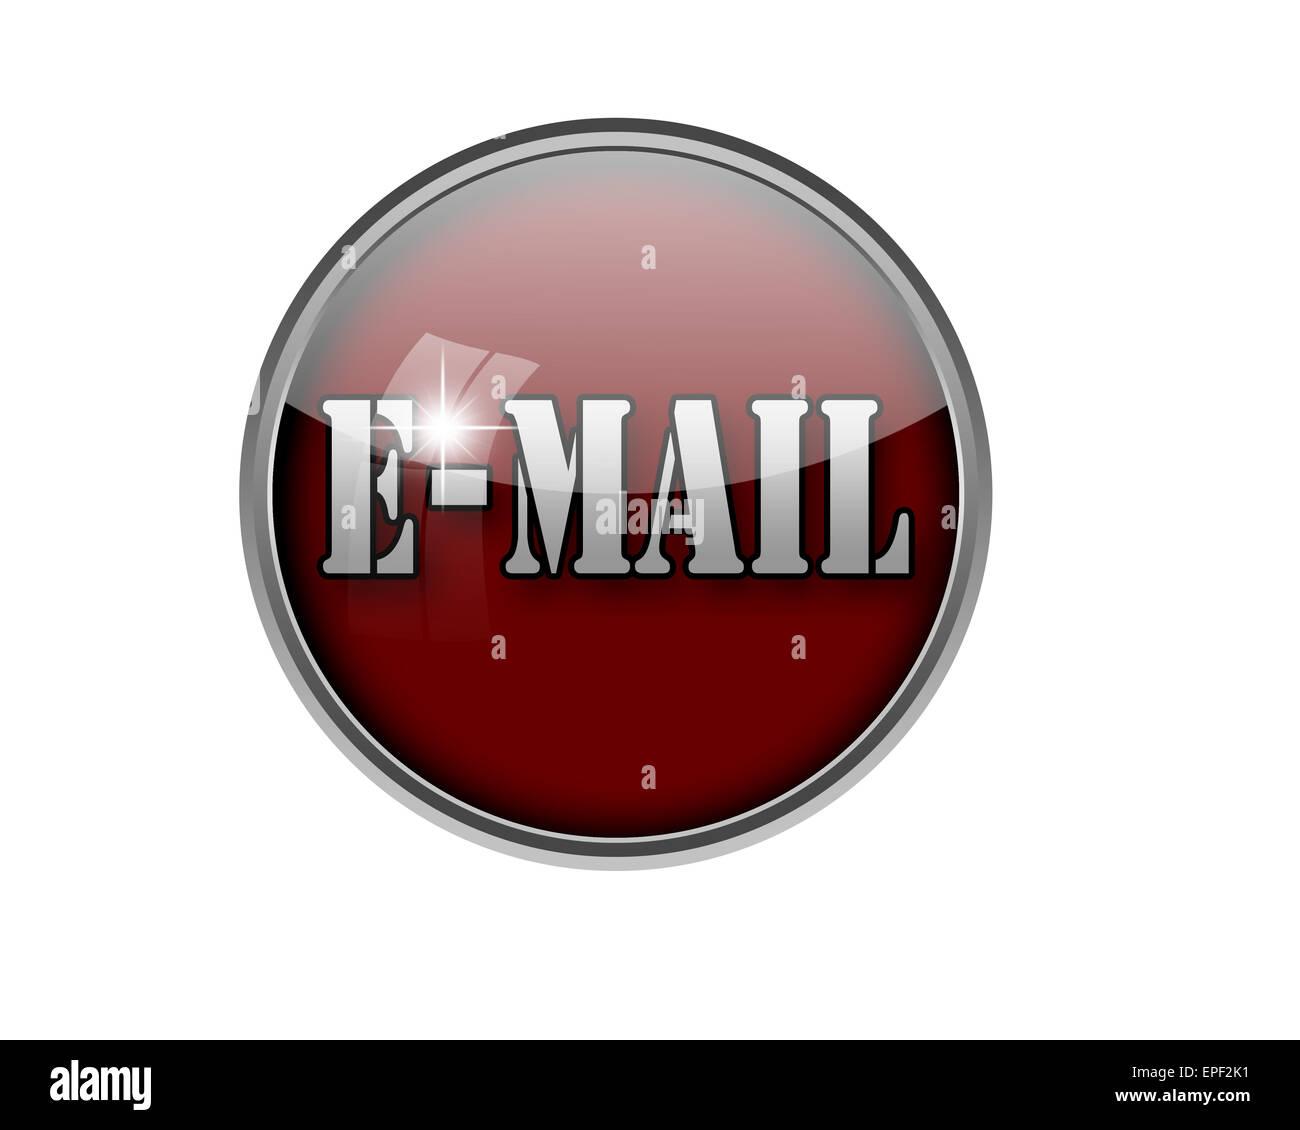 E-Mail button. - Stock Image